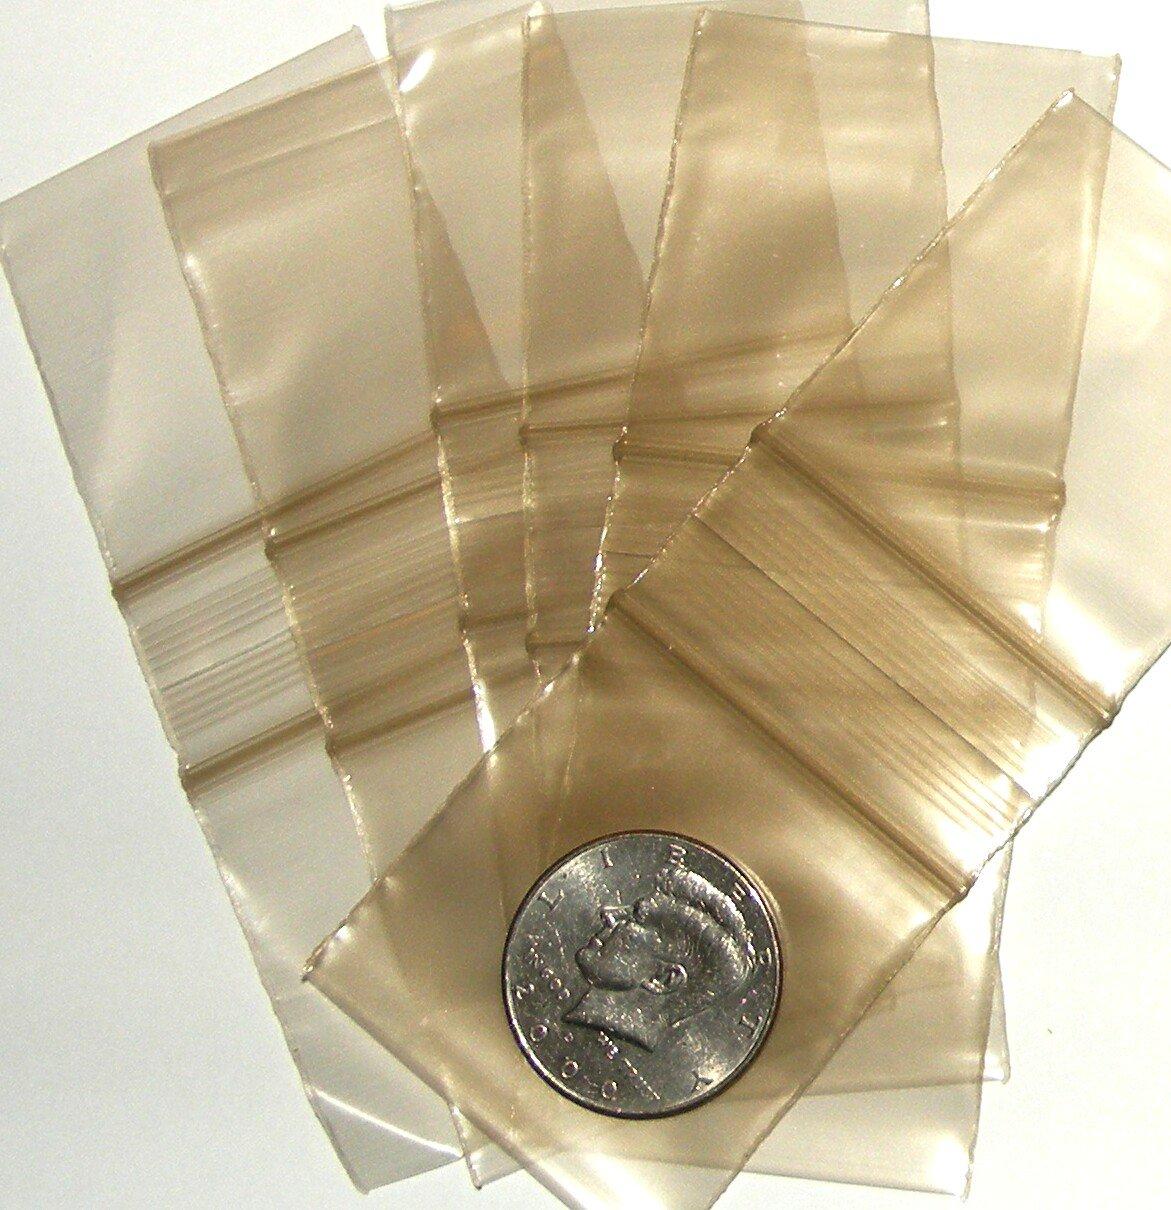 "200 Gold tinted Baggies 2 x 2"" Small Ziplock Bags 2020"